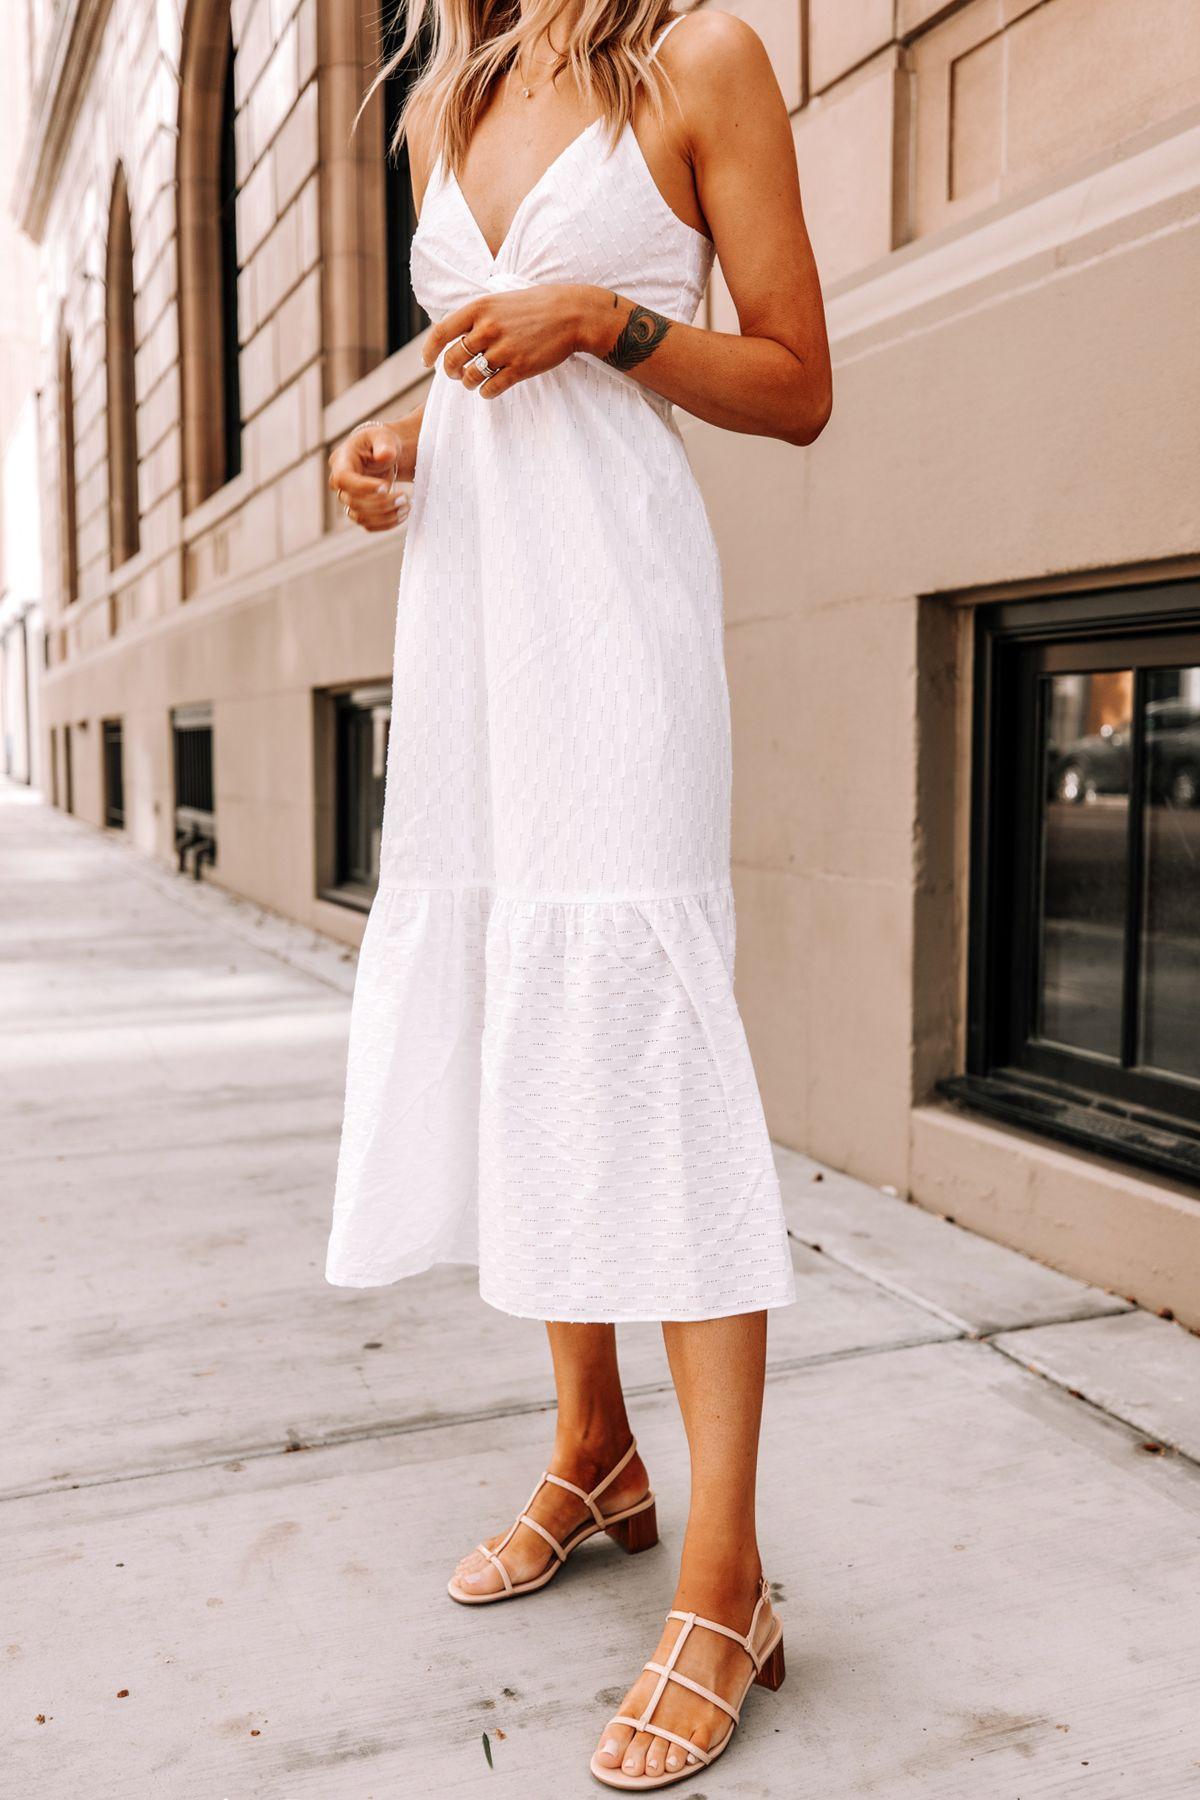 Fashion Jackson Wearing Banana Republic White Midi Dress Tan Sandals 1 Summer Dresses White Dress Summer Fashion [ 1800 x 1200 Pixel ]